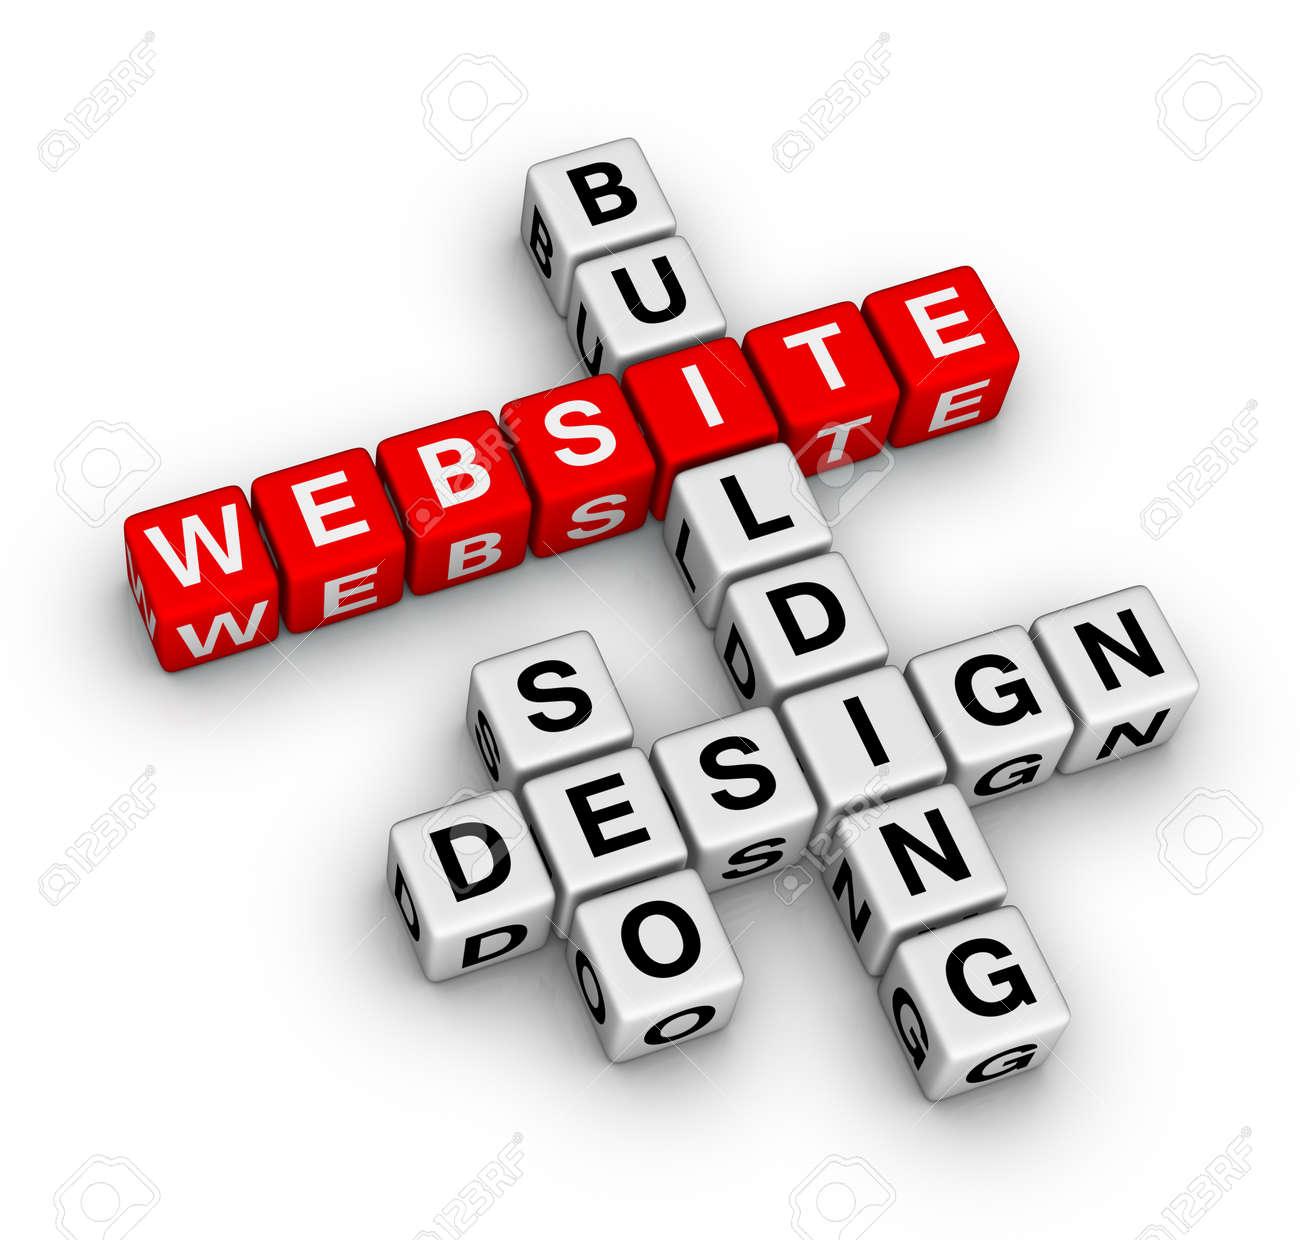 website building Stock Photo - 9673143